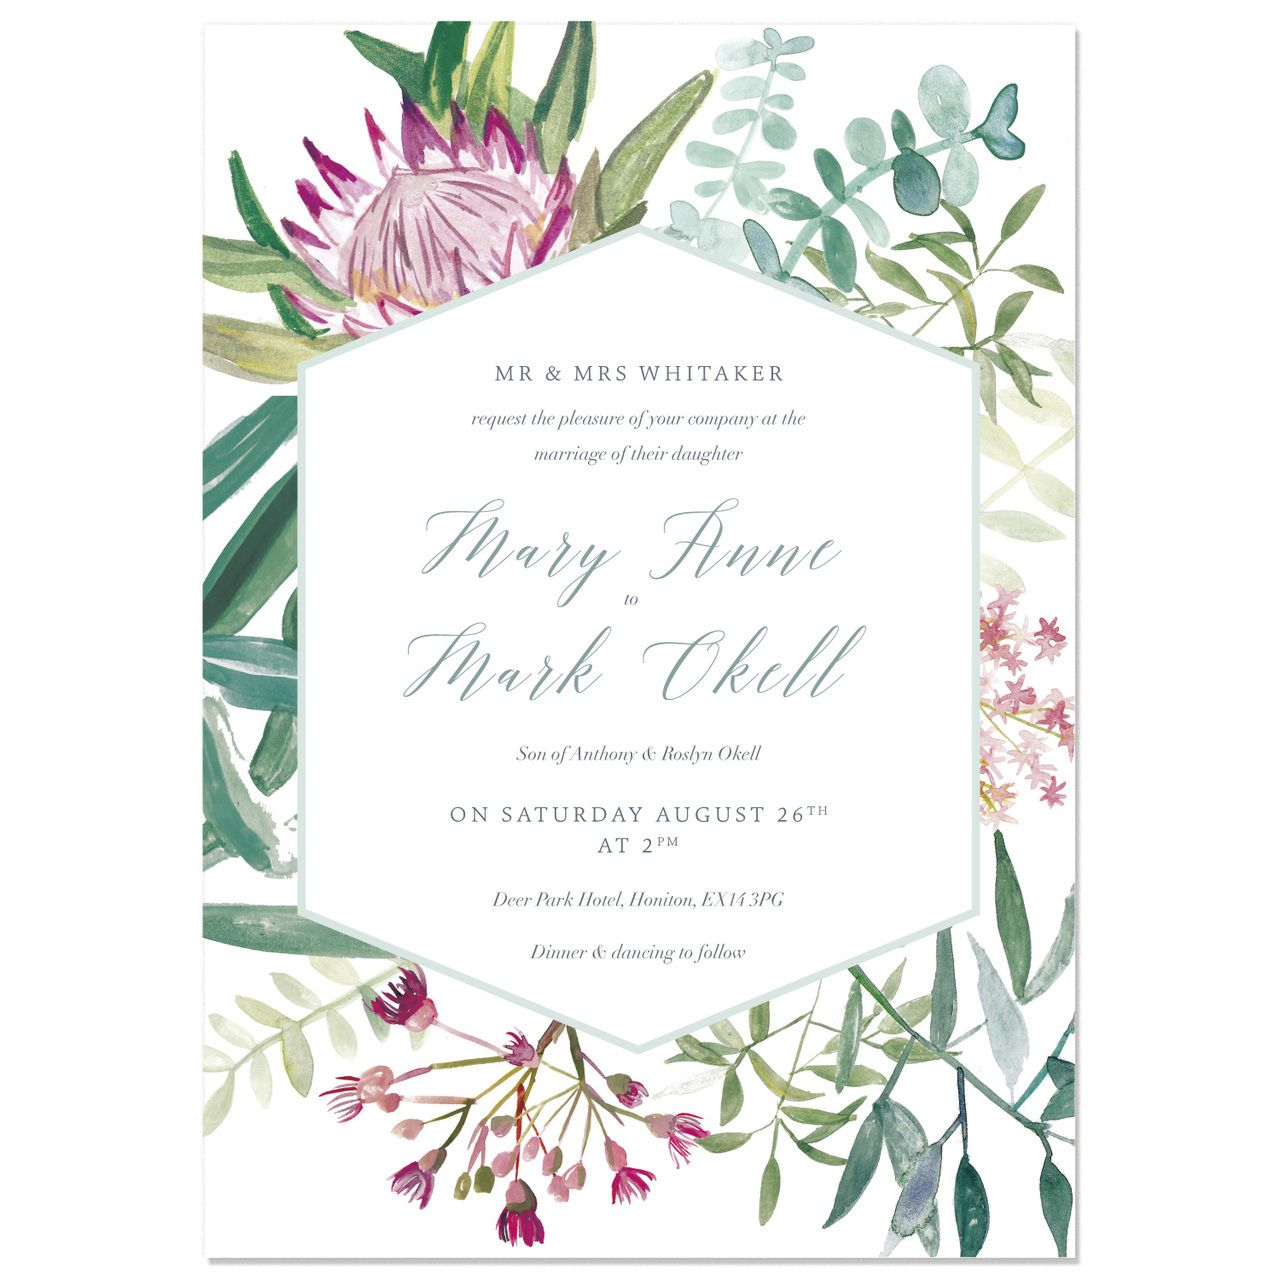 Protea Botanical Invite By Hollyhock Lane From 2 00 Per Invite Http Ww Flower Wedding Invitation Wedding Invitation Samples Botanical Wedding Invitations